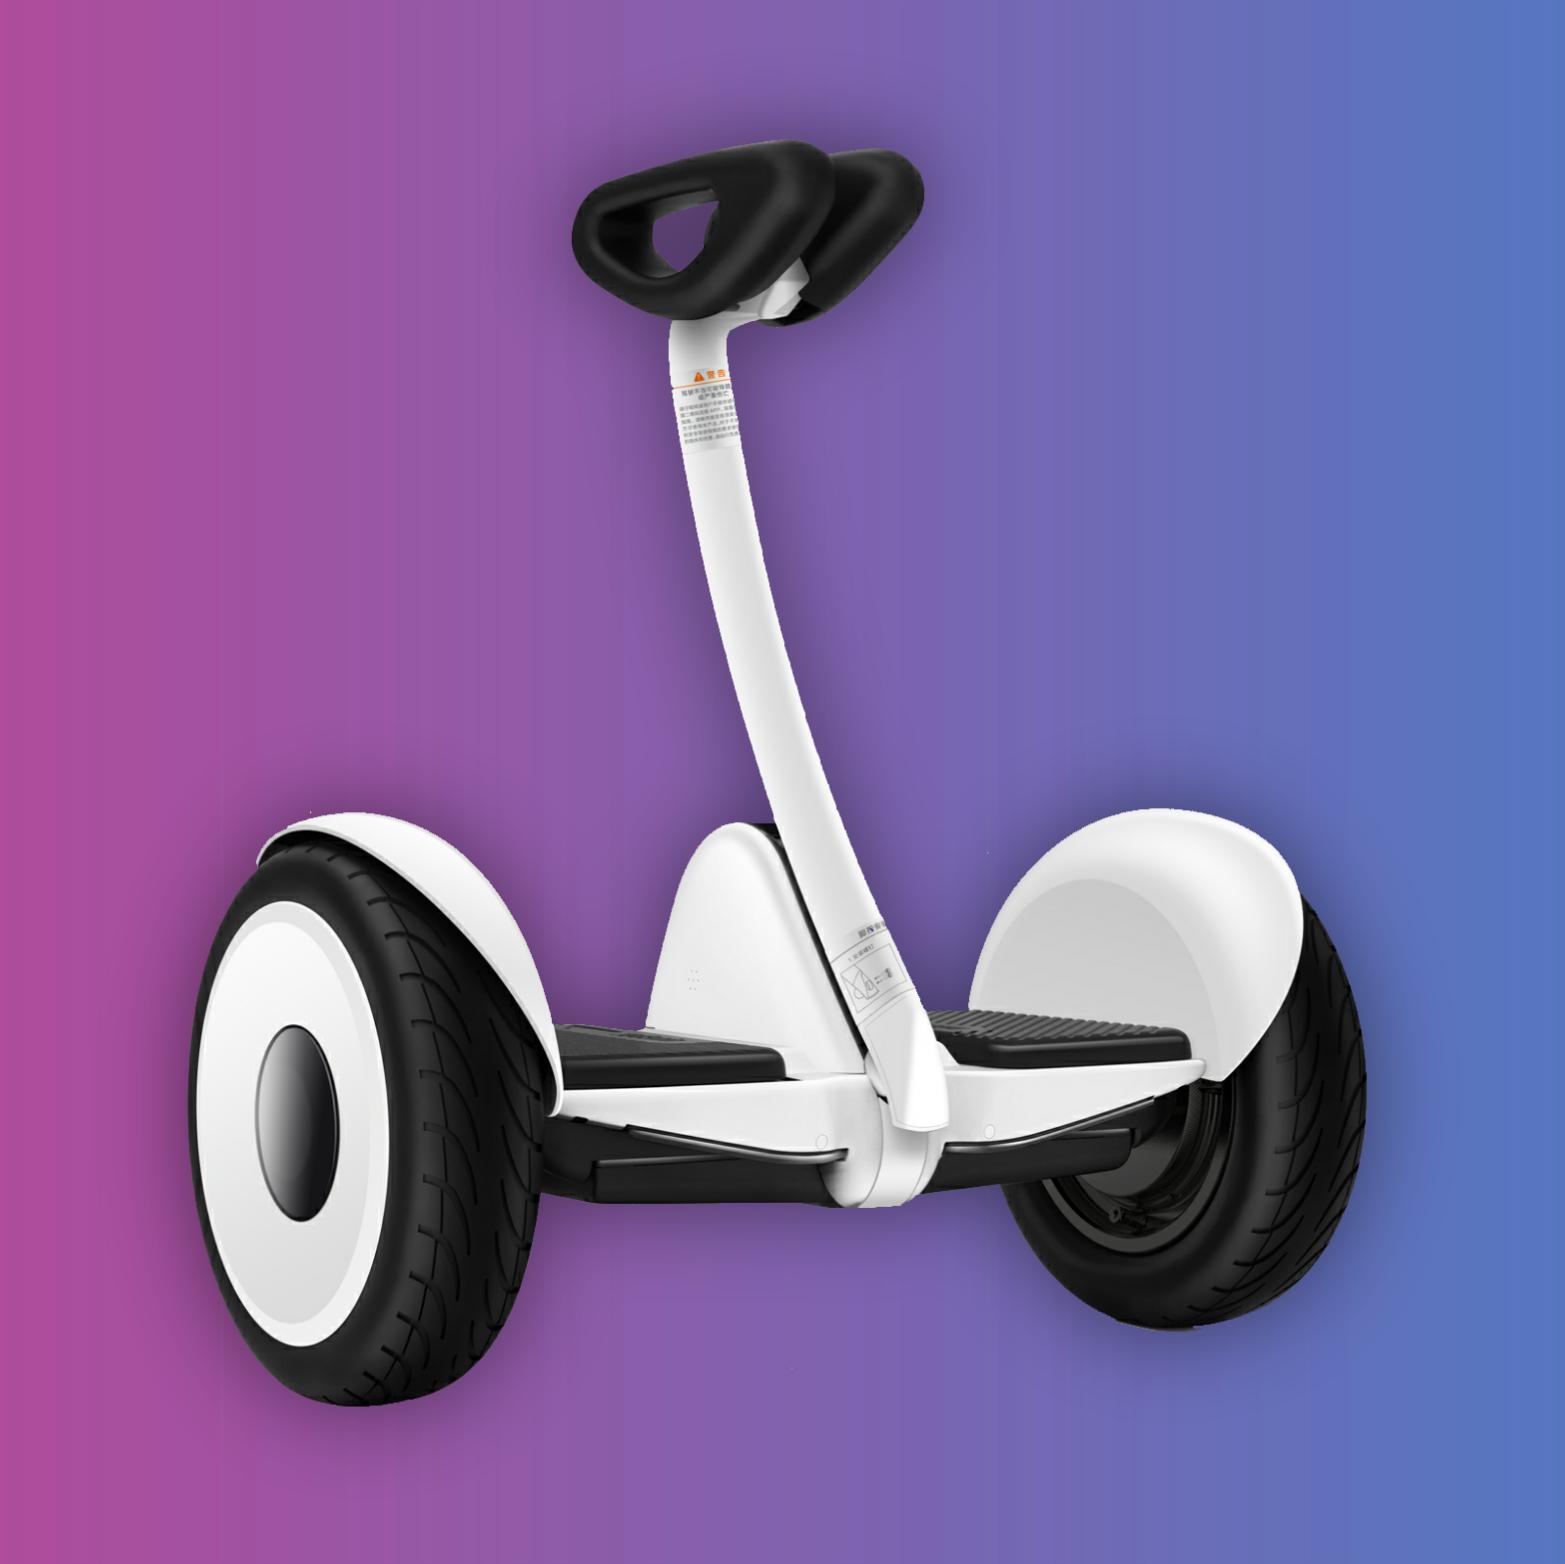 [FR Grenzgänger] Ninebot Mini - Selbstbalancierender Scooter | Nicht StVZO Konform